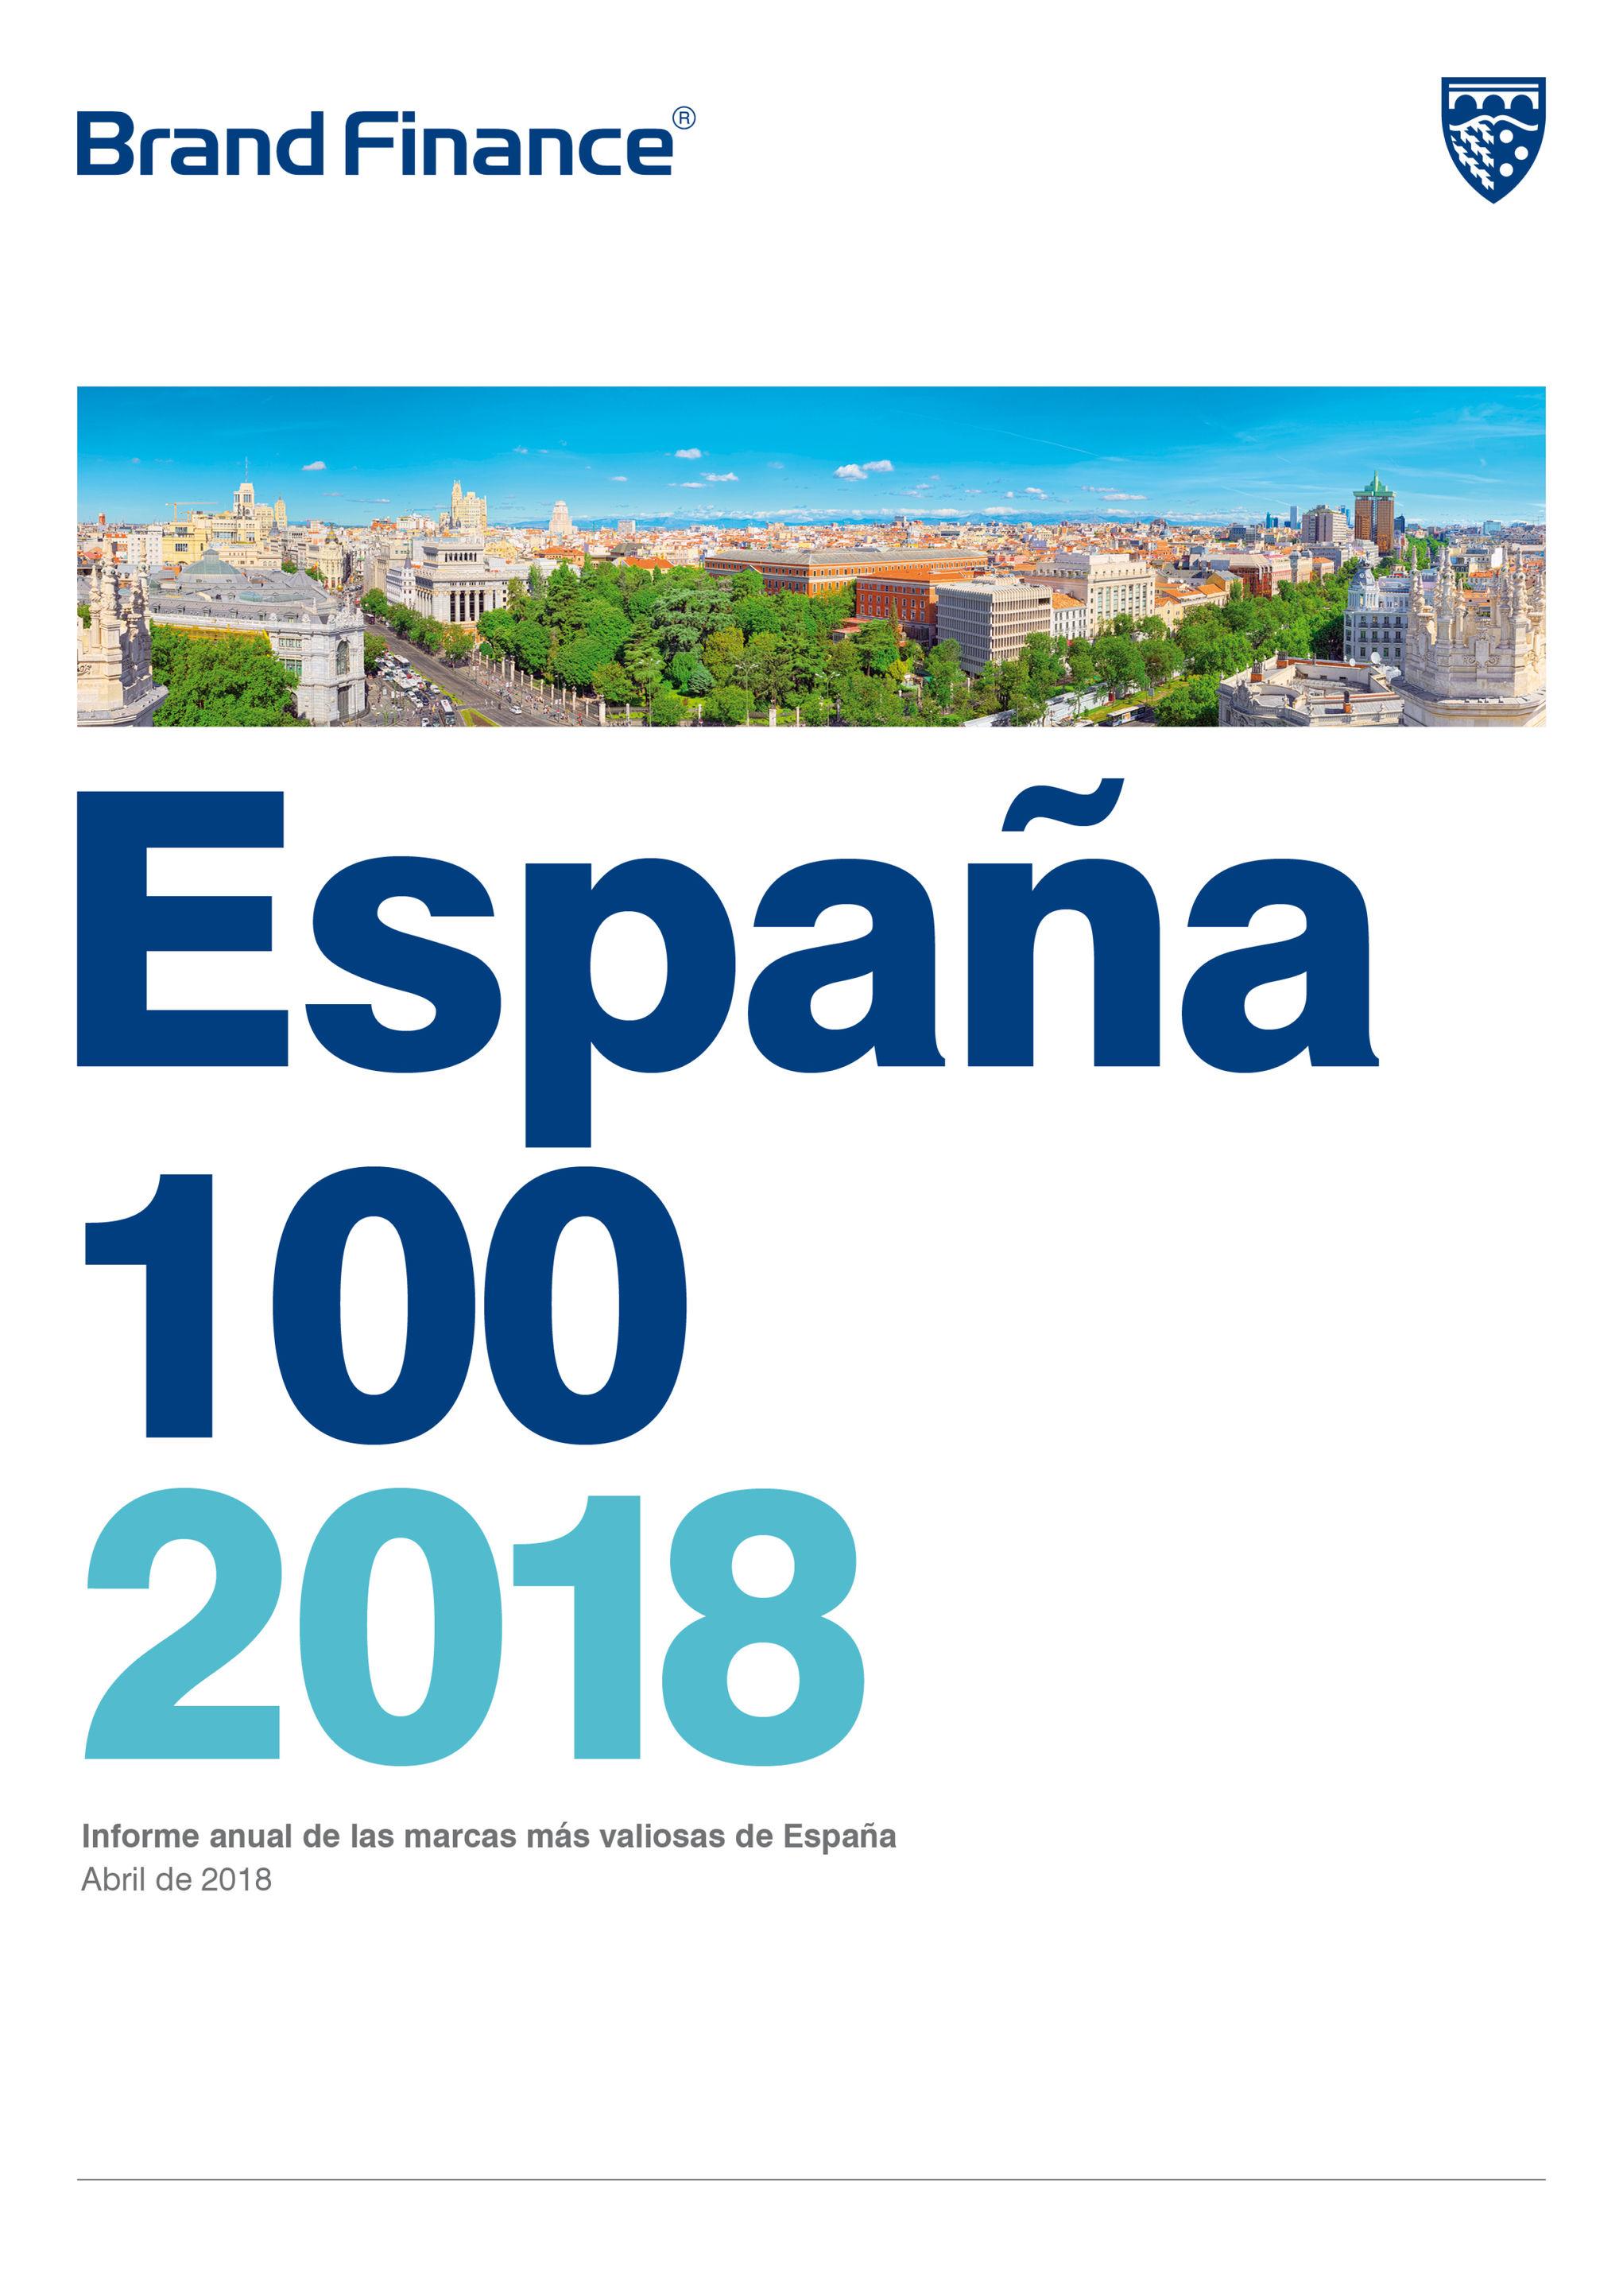 Brand Finance Spain 100 2018